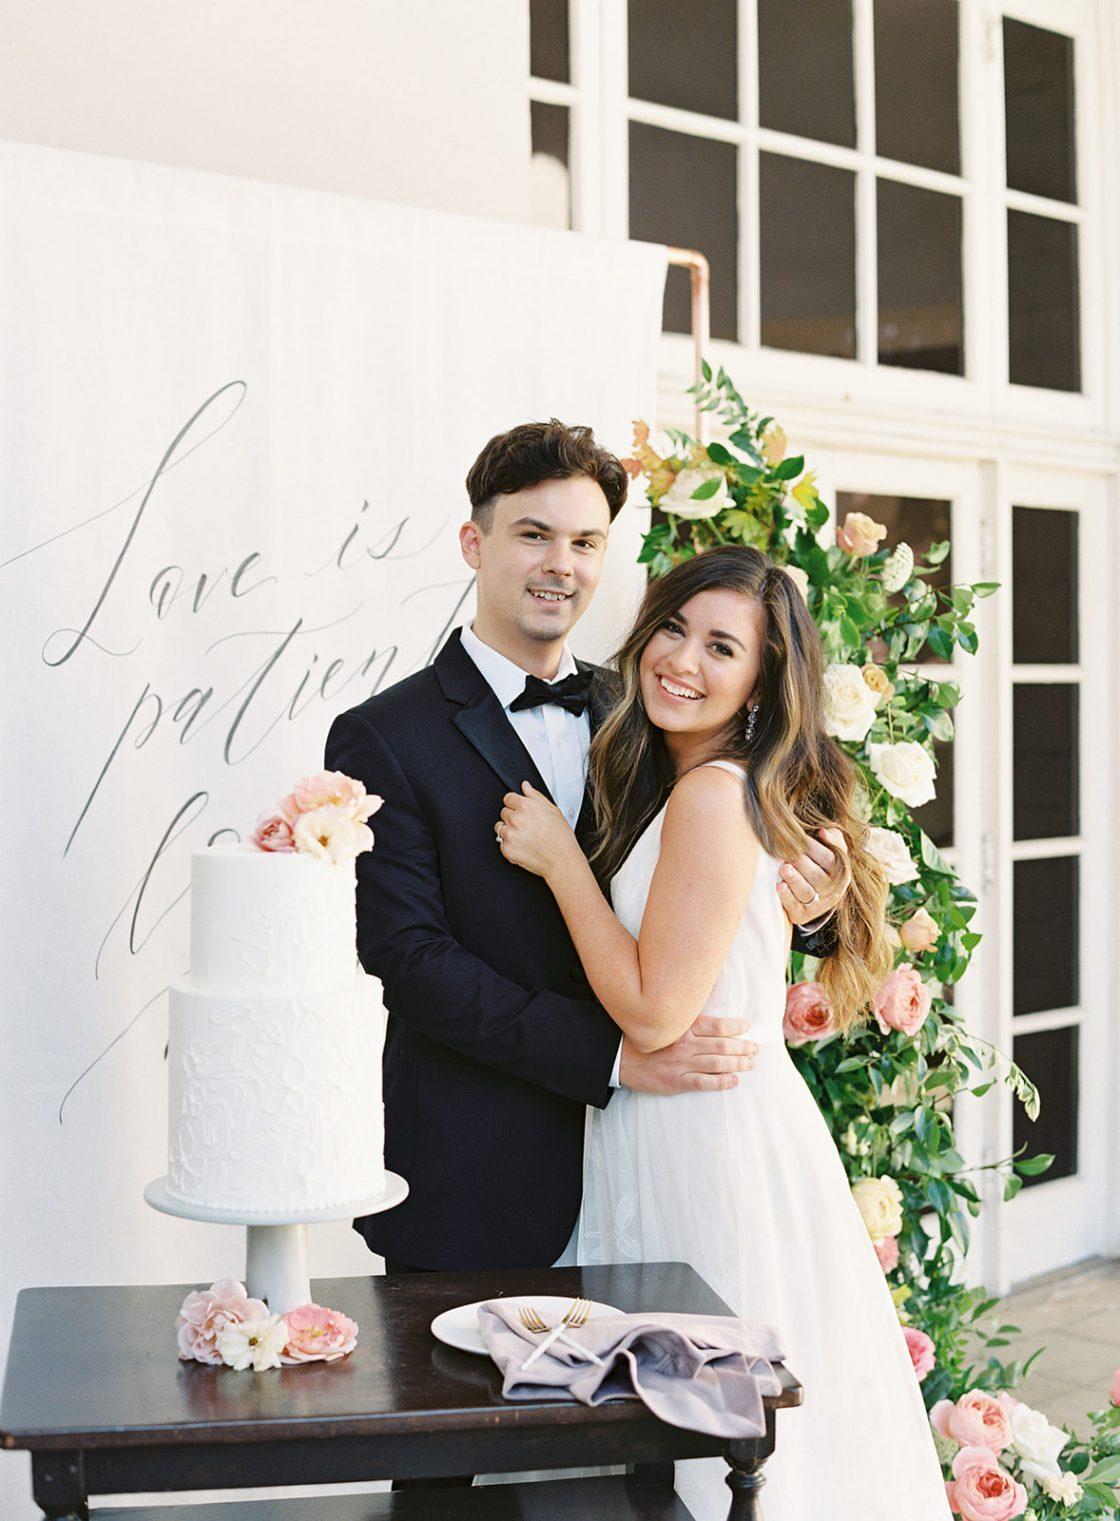 Bride and Groom Wedding Cake Portrait